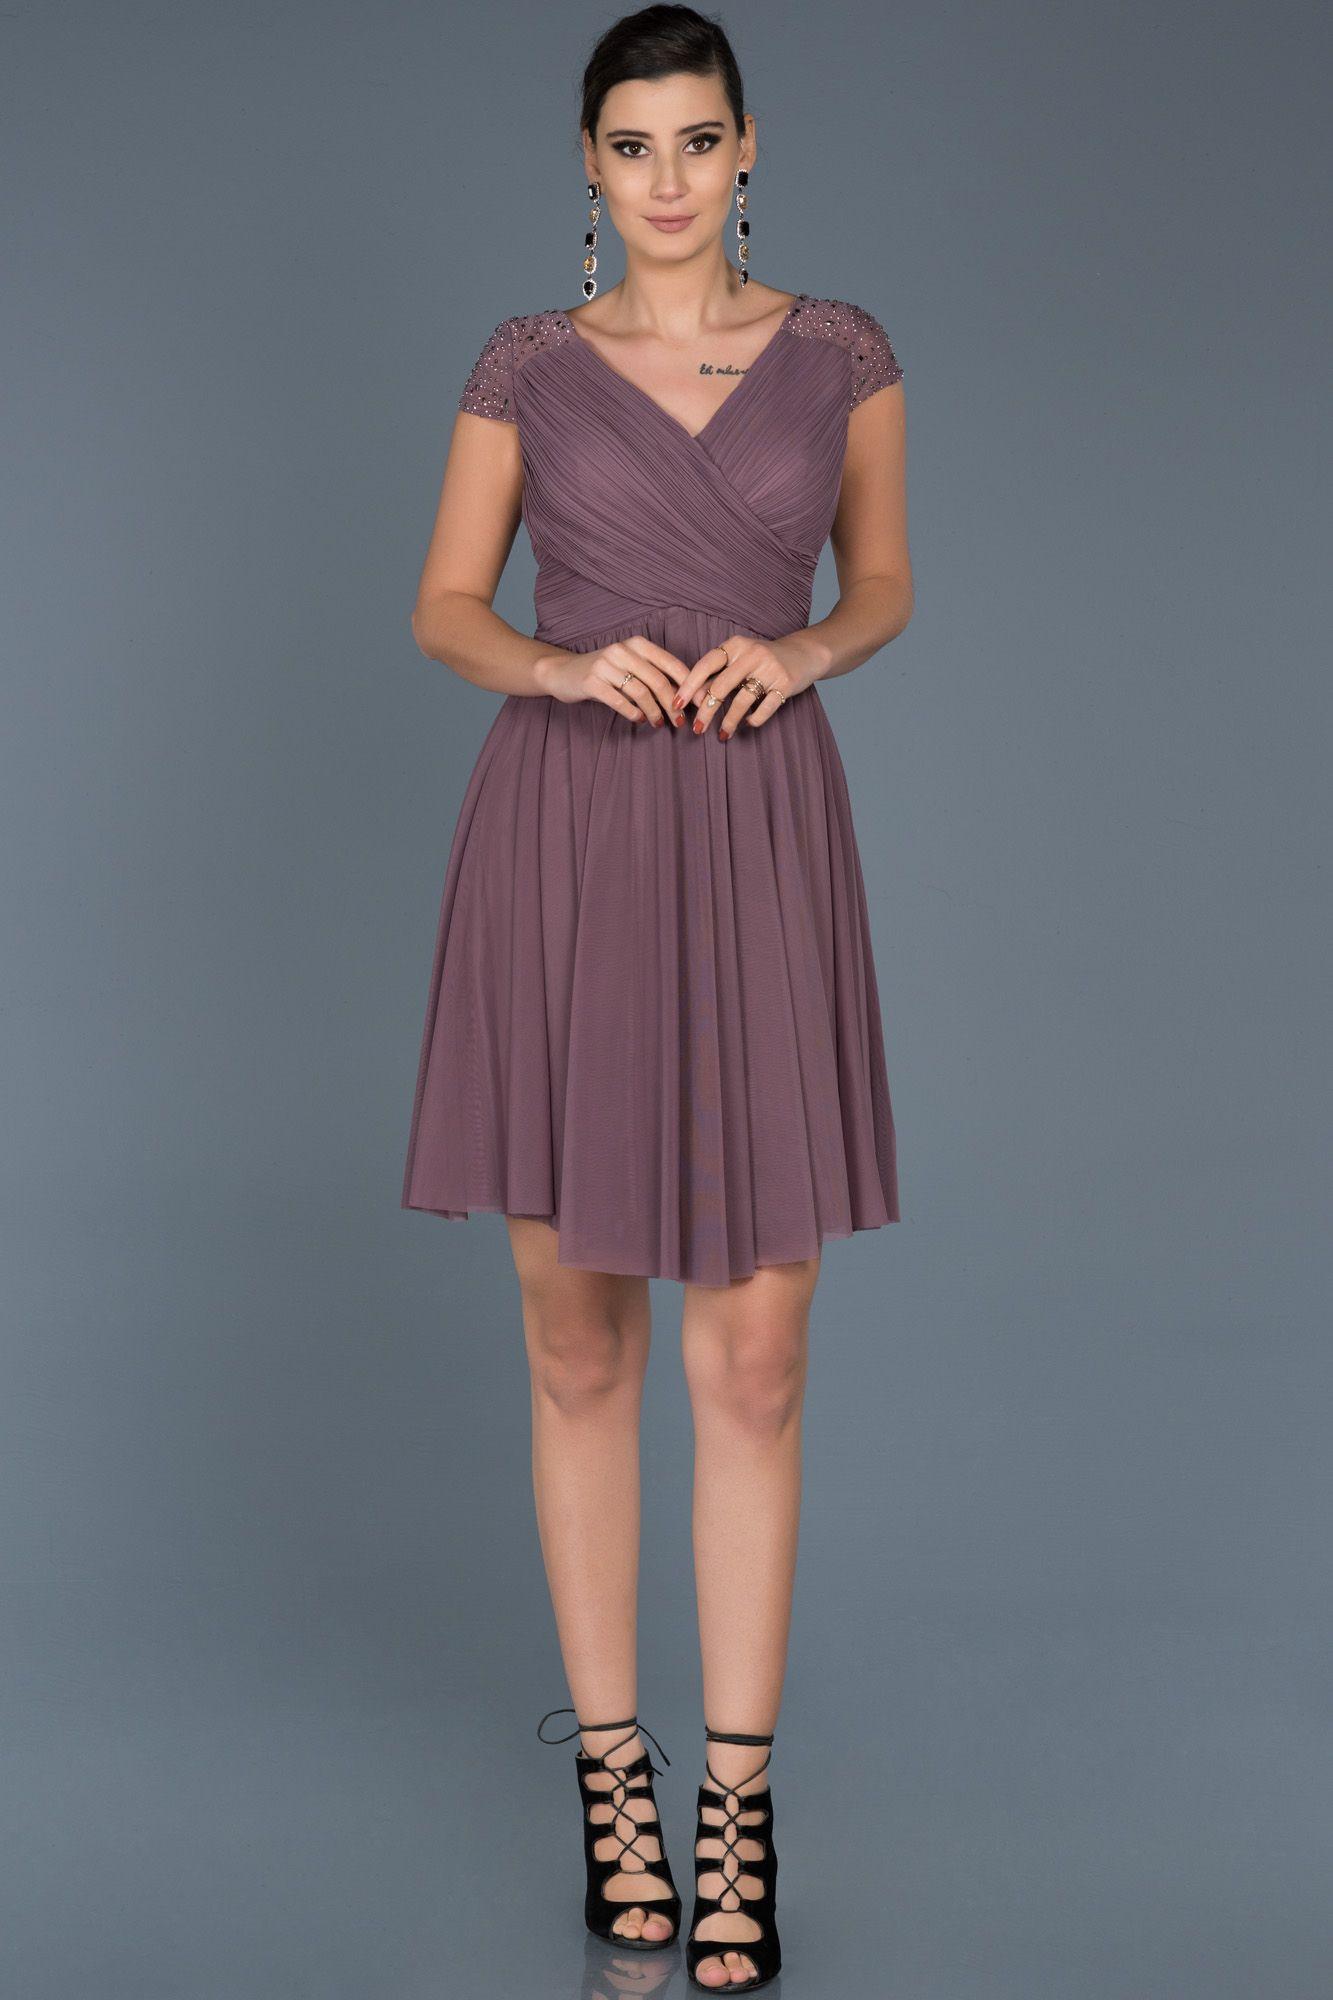 Lavanta V Yaka Sifon Elbise Abk306 2020 The Dress Resmi Elbise Kisa Elbiseler